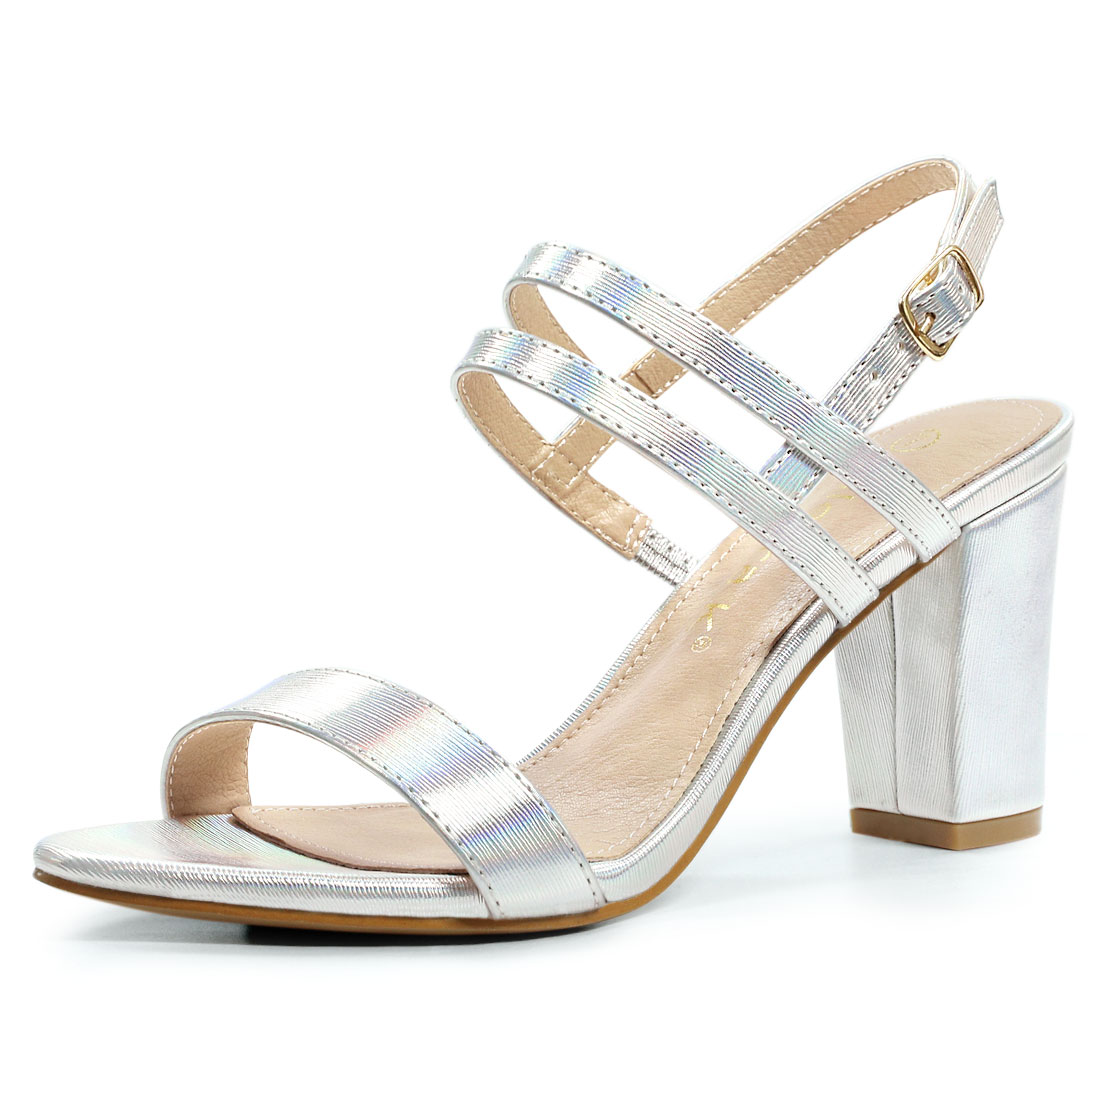 Allegra K Women's Slingback Block Heel Ankle Strap Sandals Silver US 8